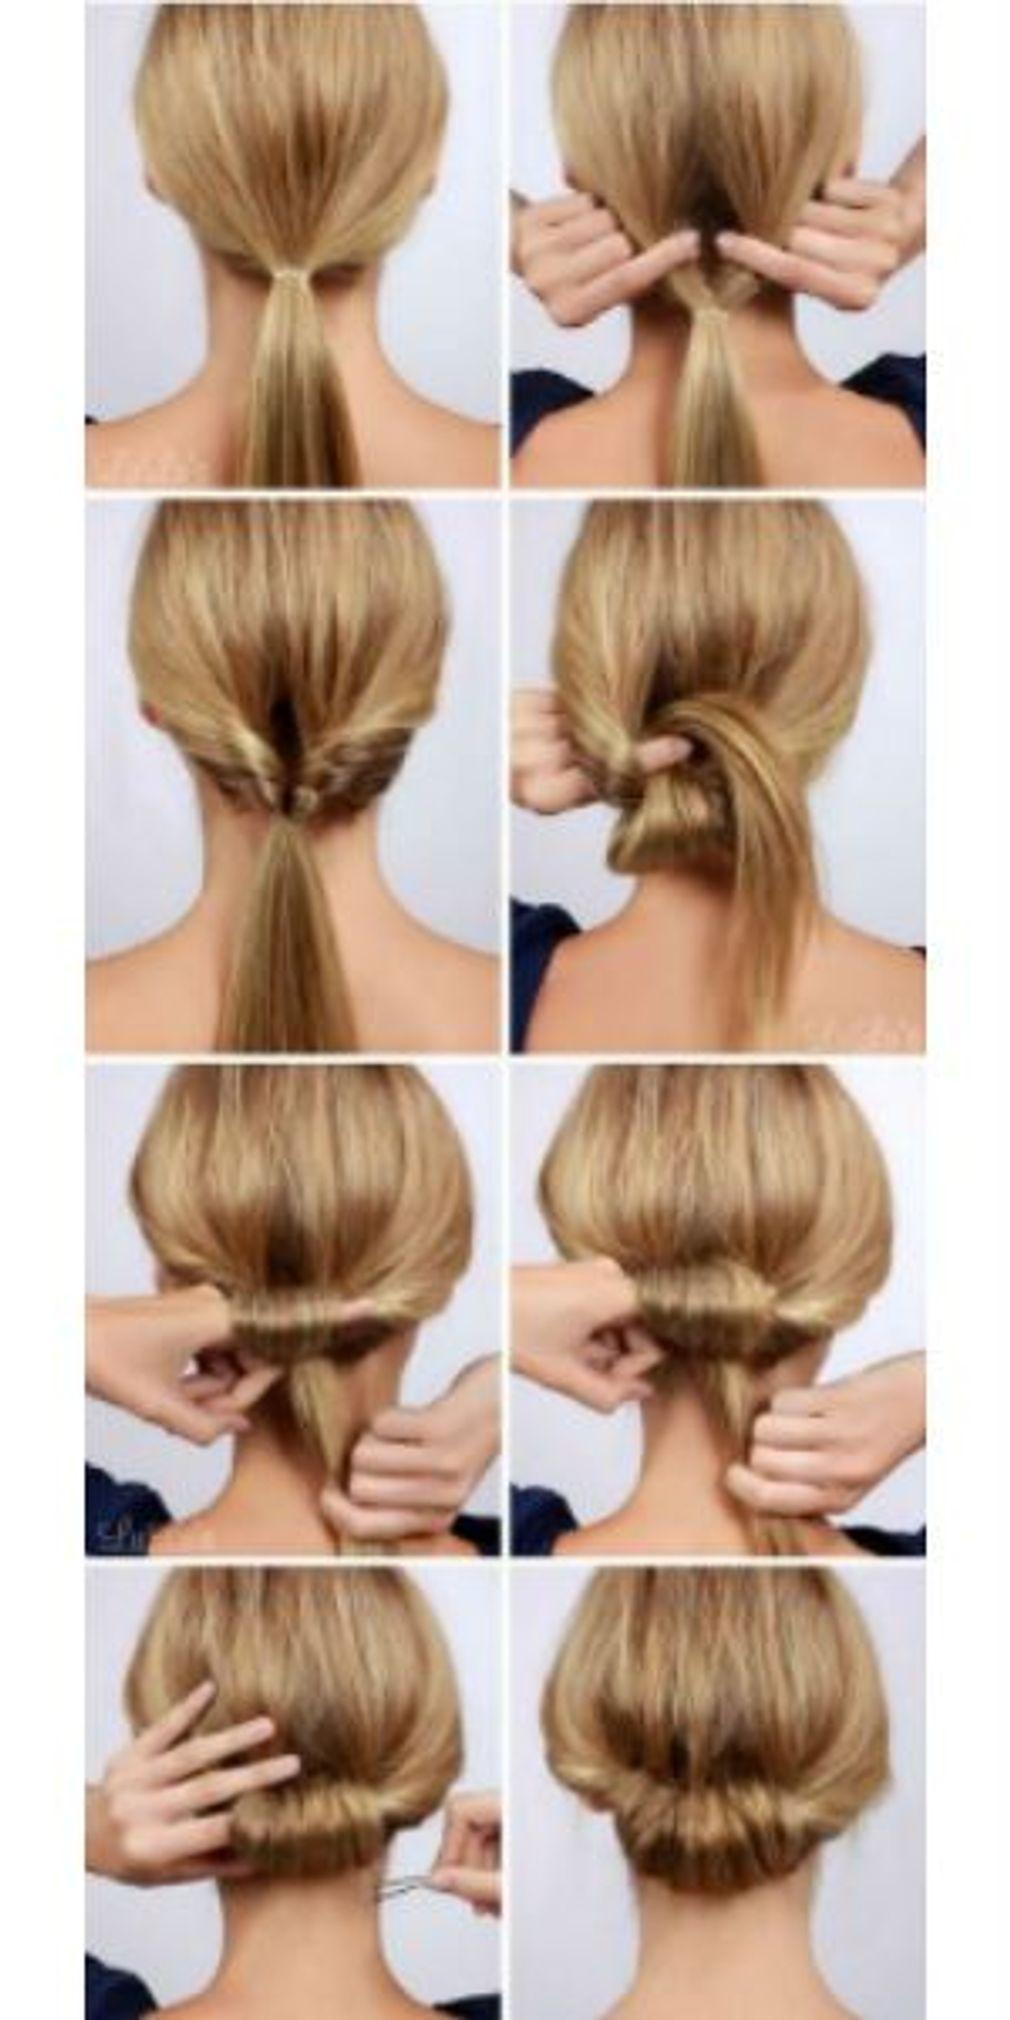 Chignon classique : comment faire un chignon classique | Coiffure facile, Tutoriel de coiffure ...